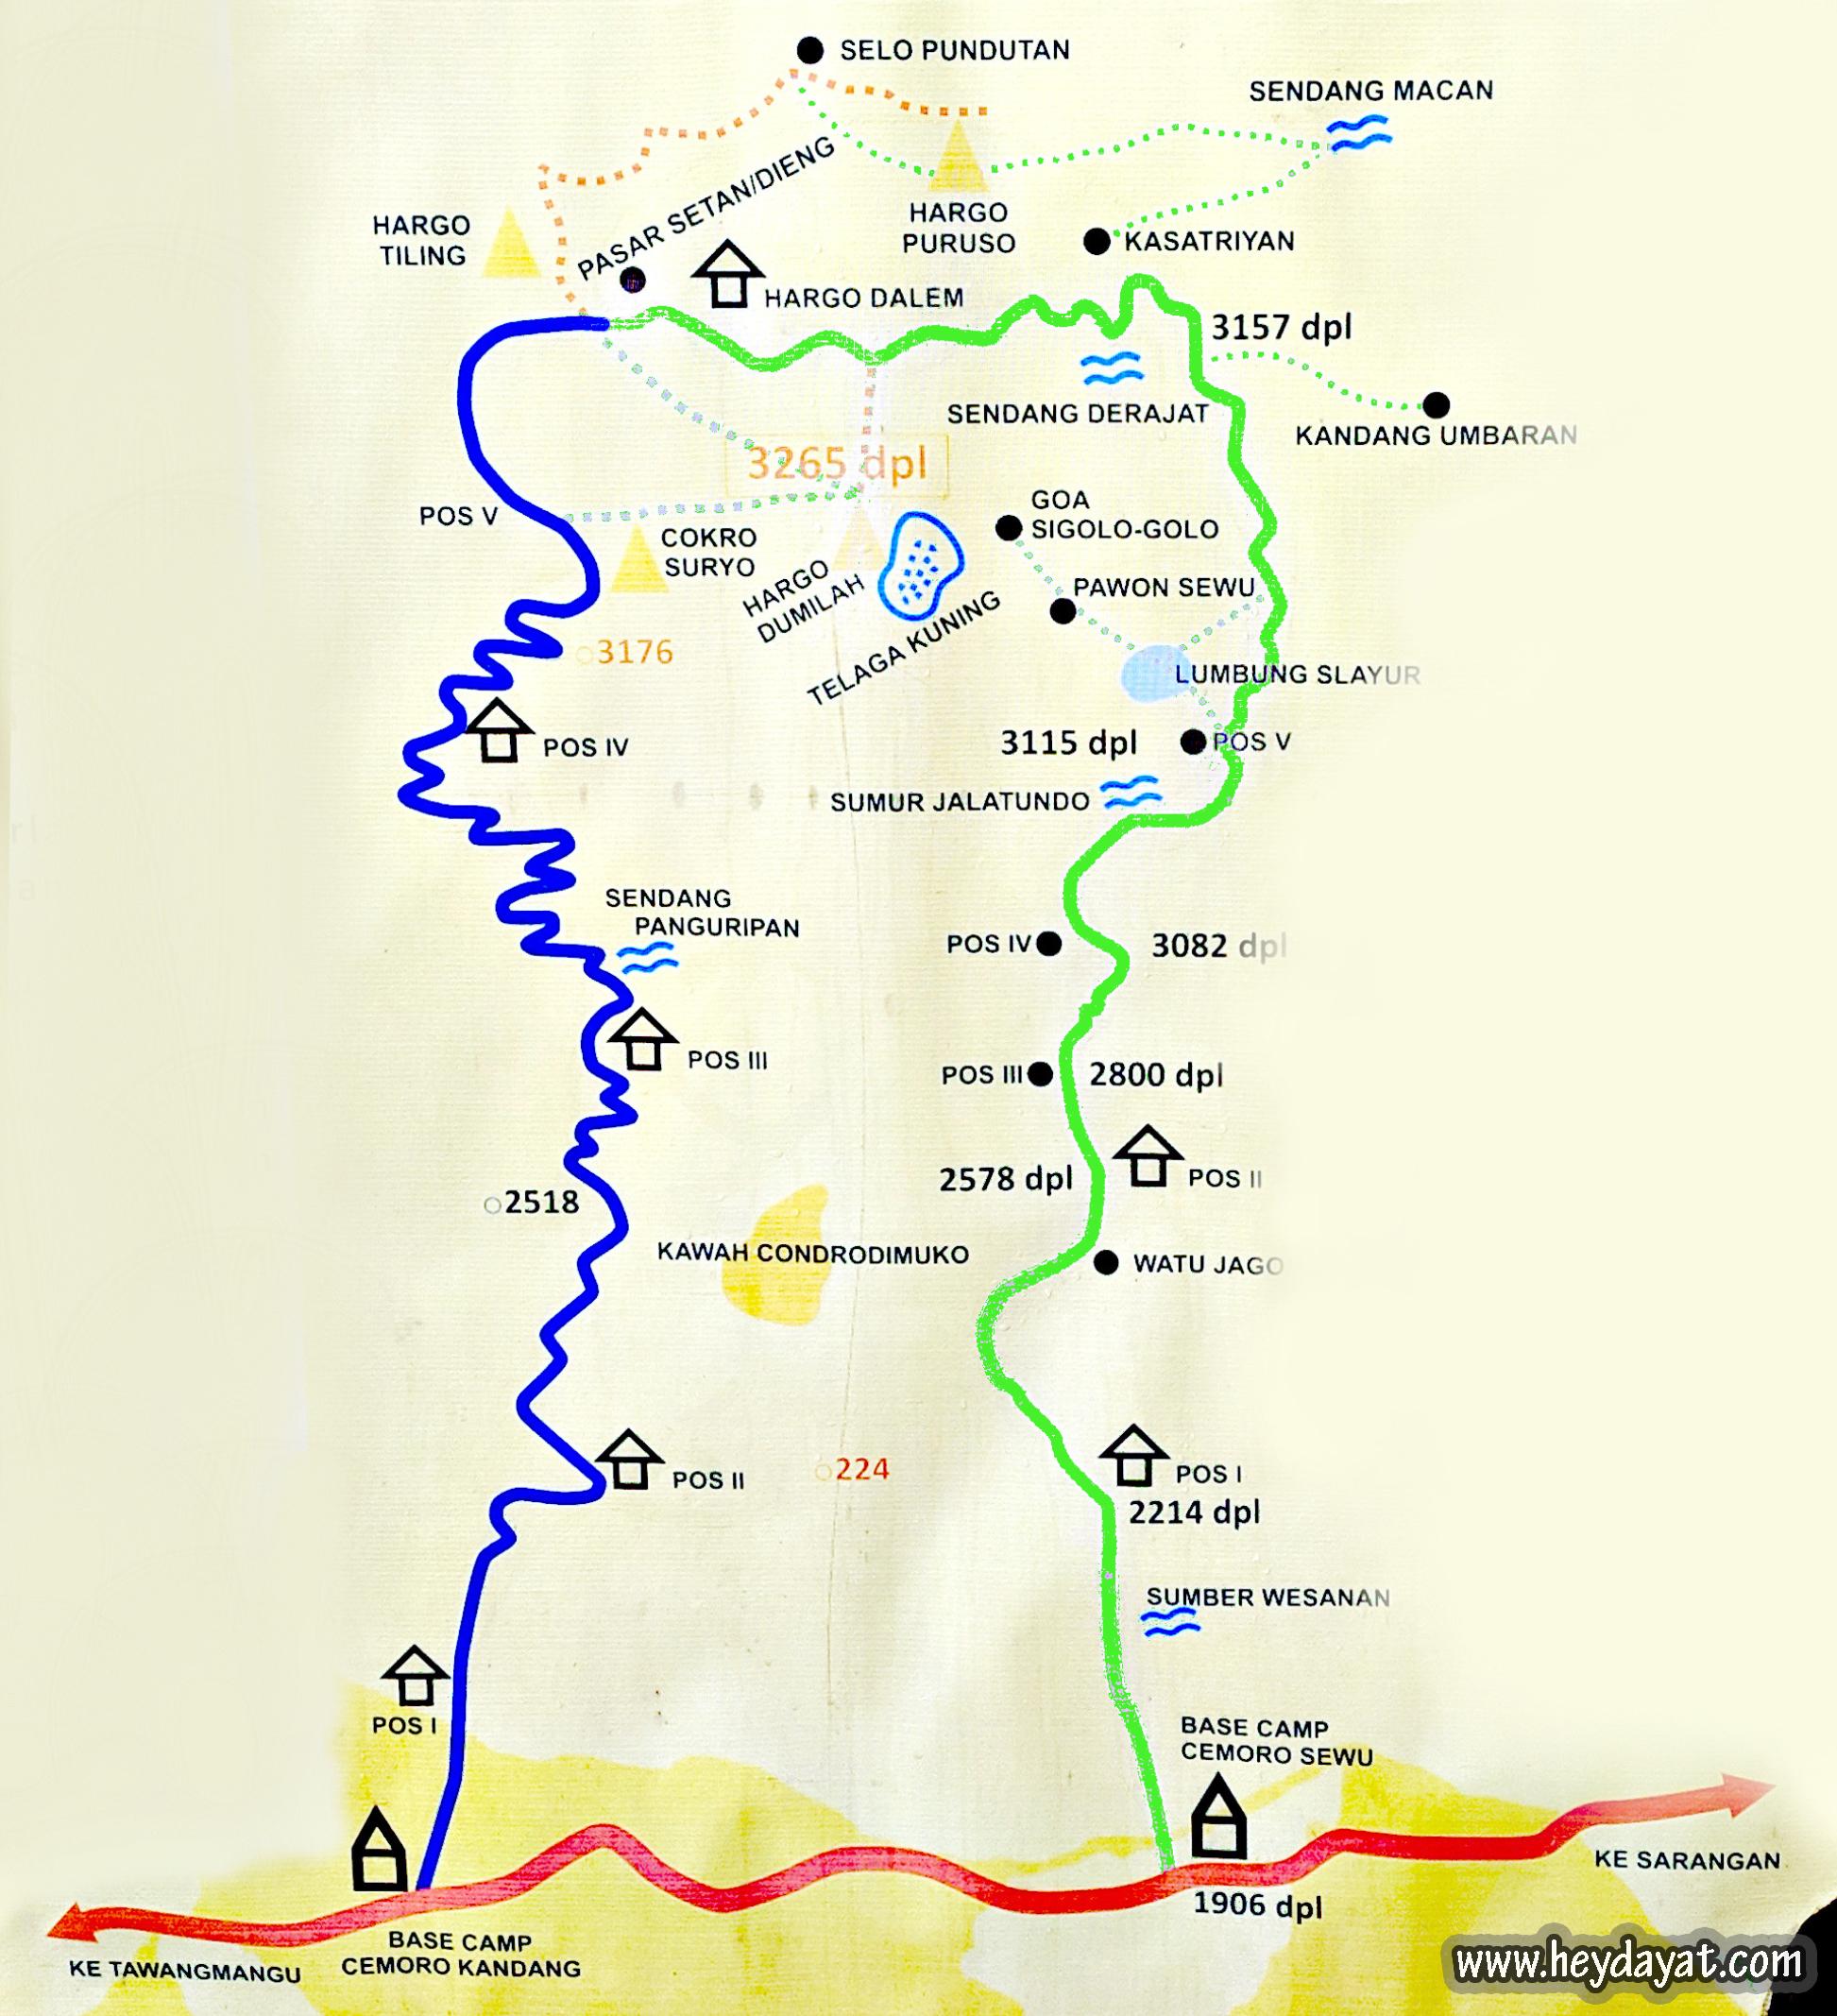 Peta jalur pendakian Gunung Lawu via Cemoro Kandang dan Cemoro Sewu